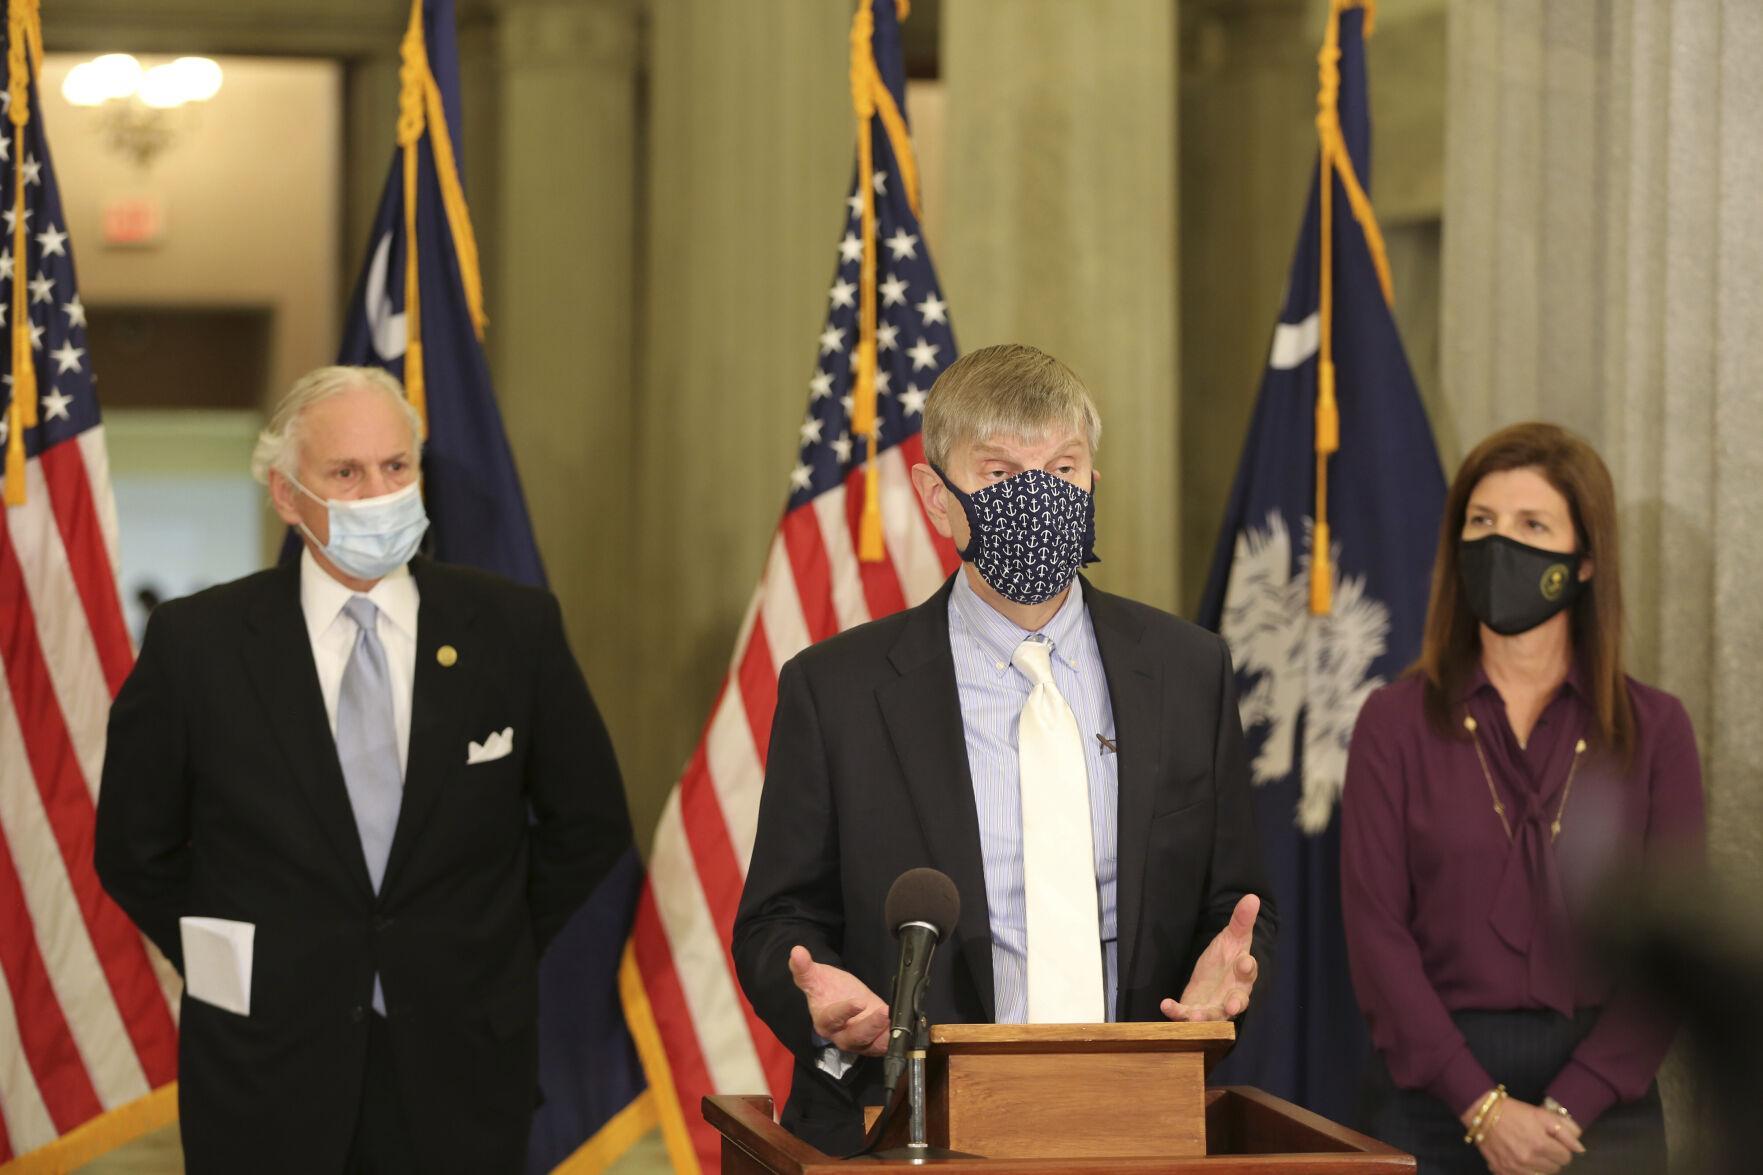 POST AND COURIER – DHEC says all schools should require masks indoors, urges legislators to repeal ban